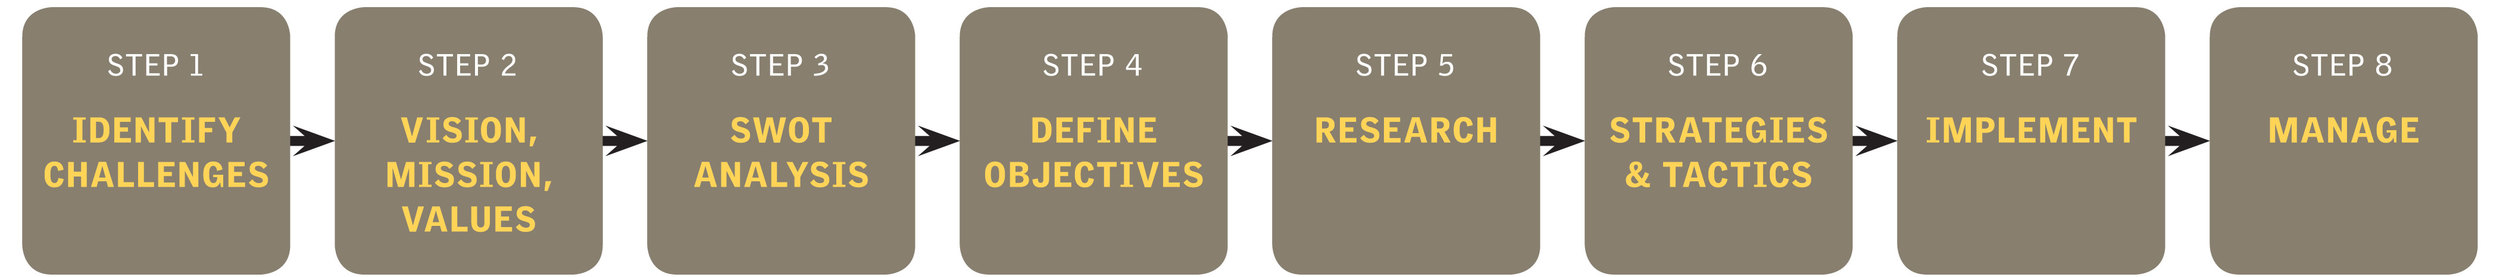 Strategic_Plan.jpg